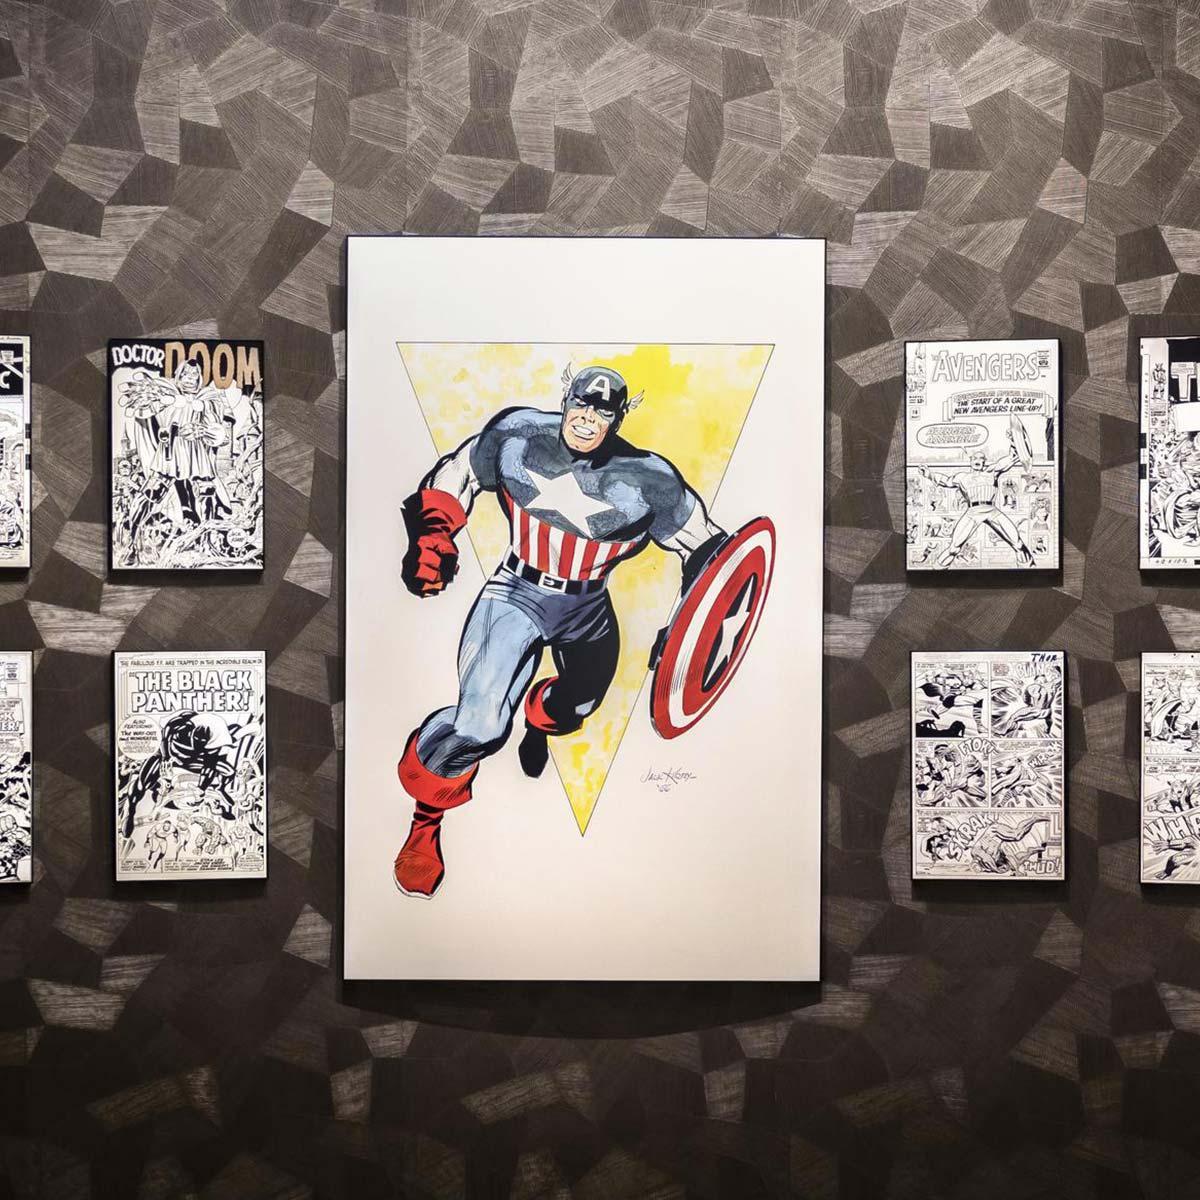 Obras de arte de Superhéroes por todas partes